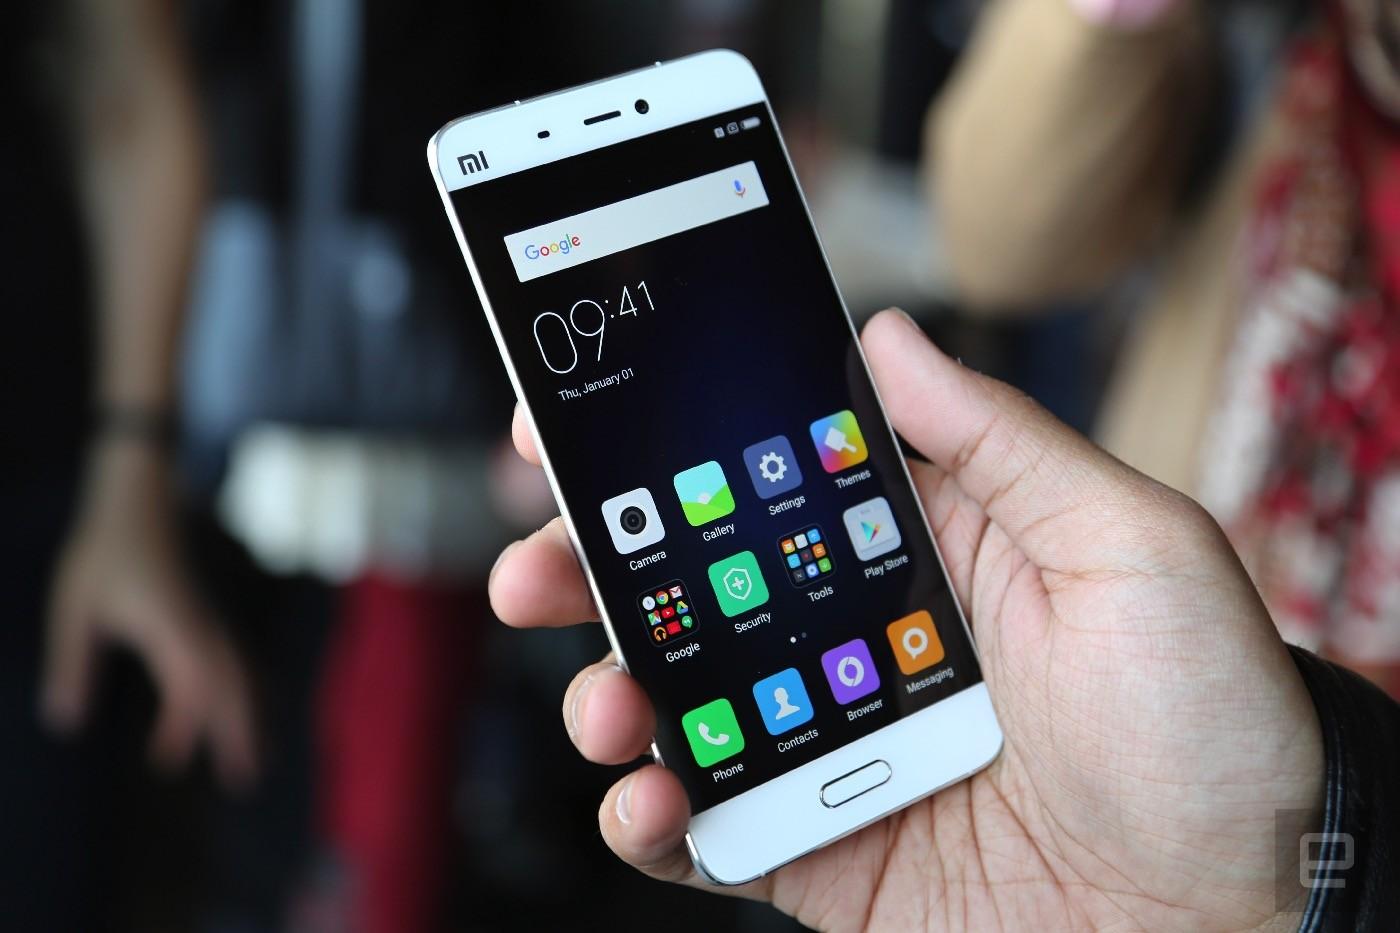 Sürpriz hit: Xiaomi Mi 5